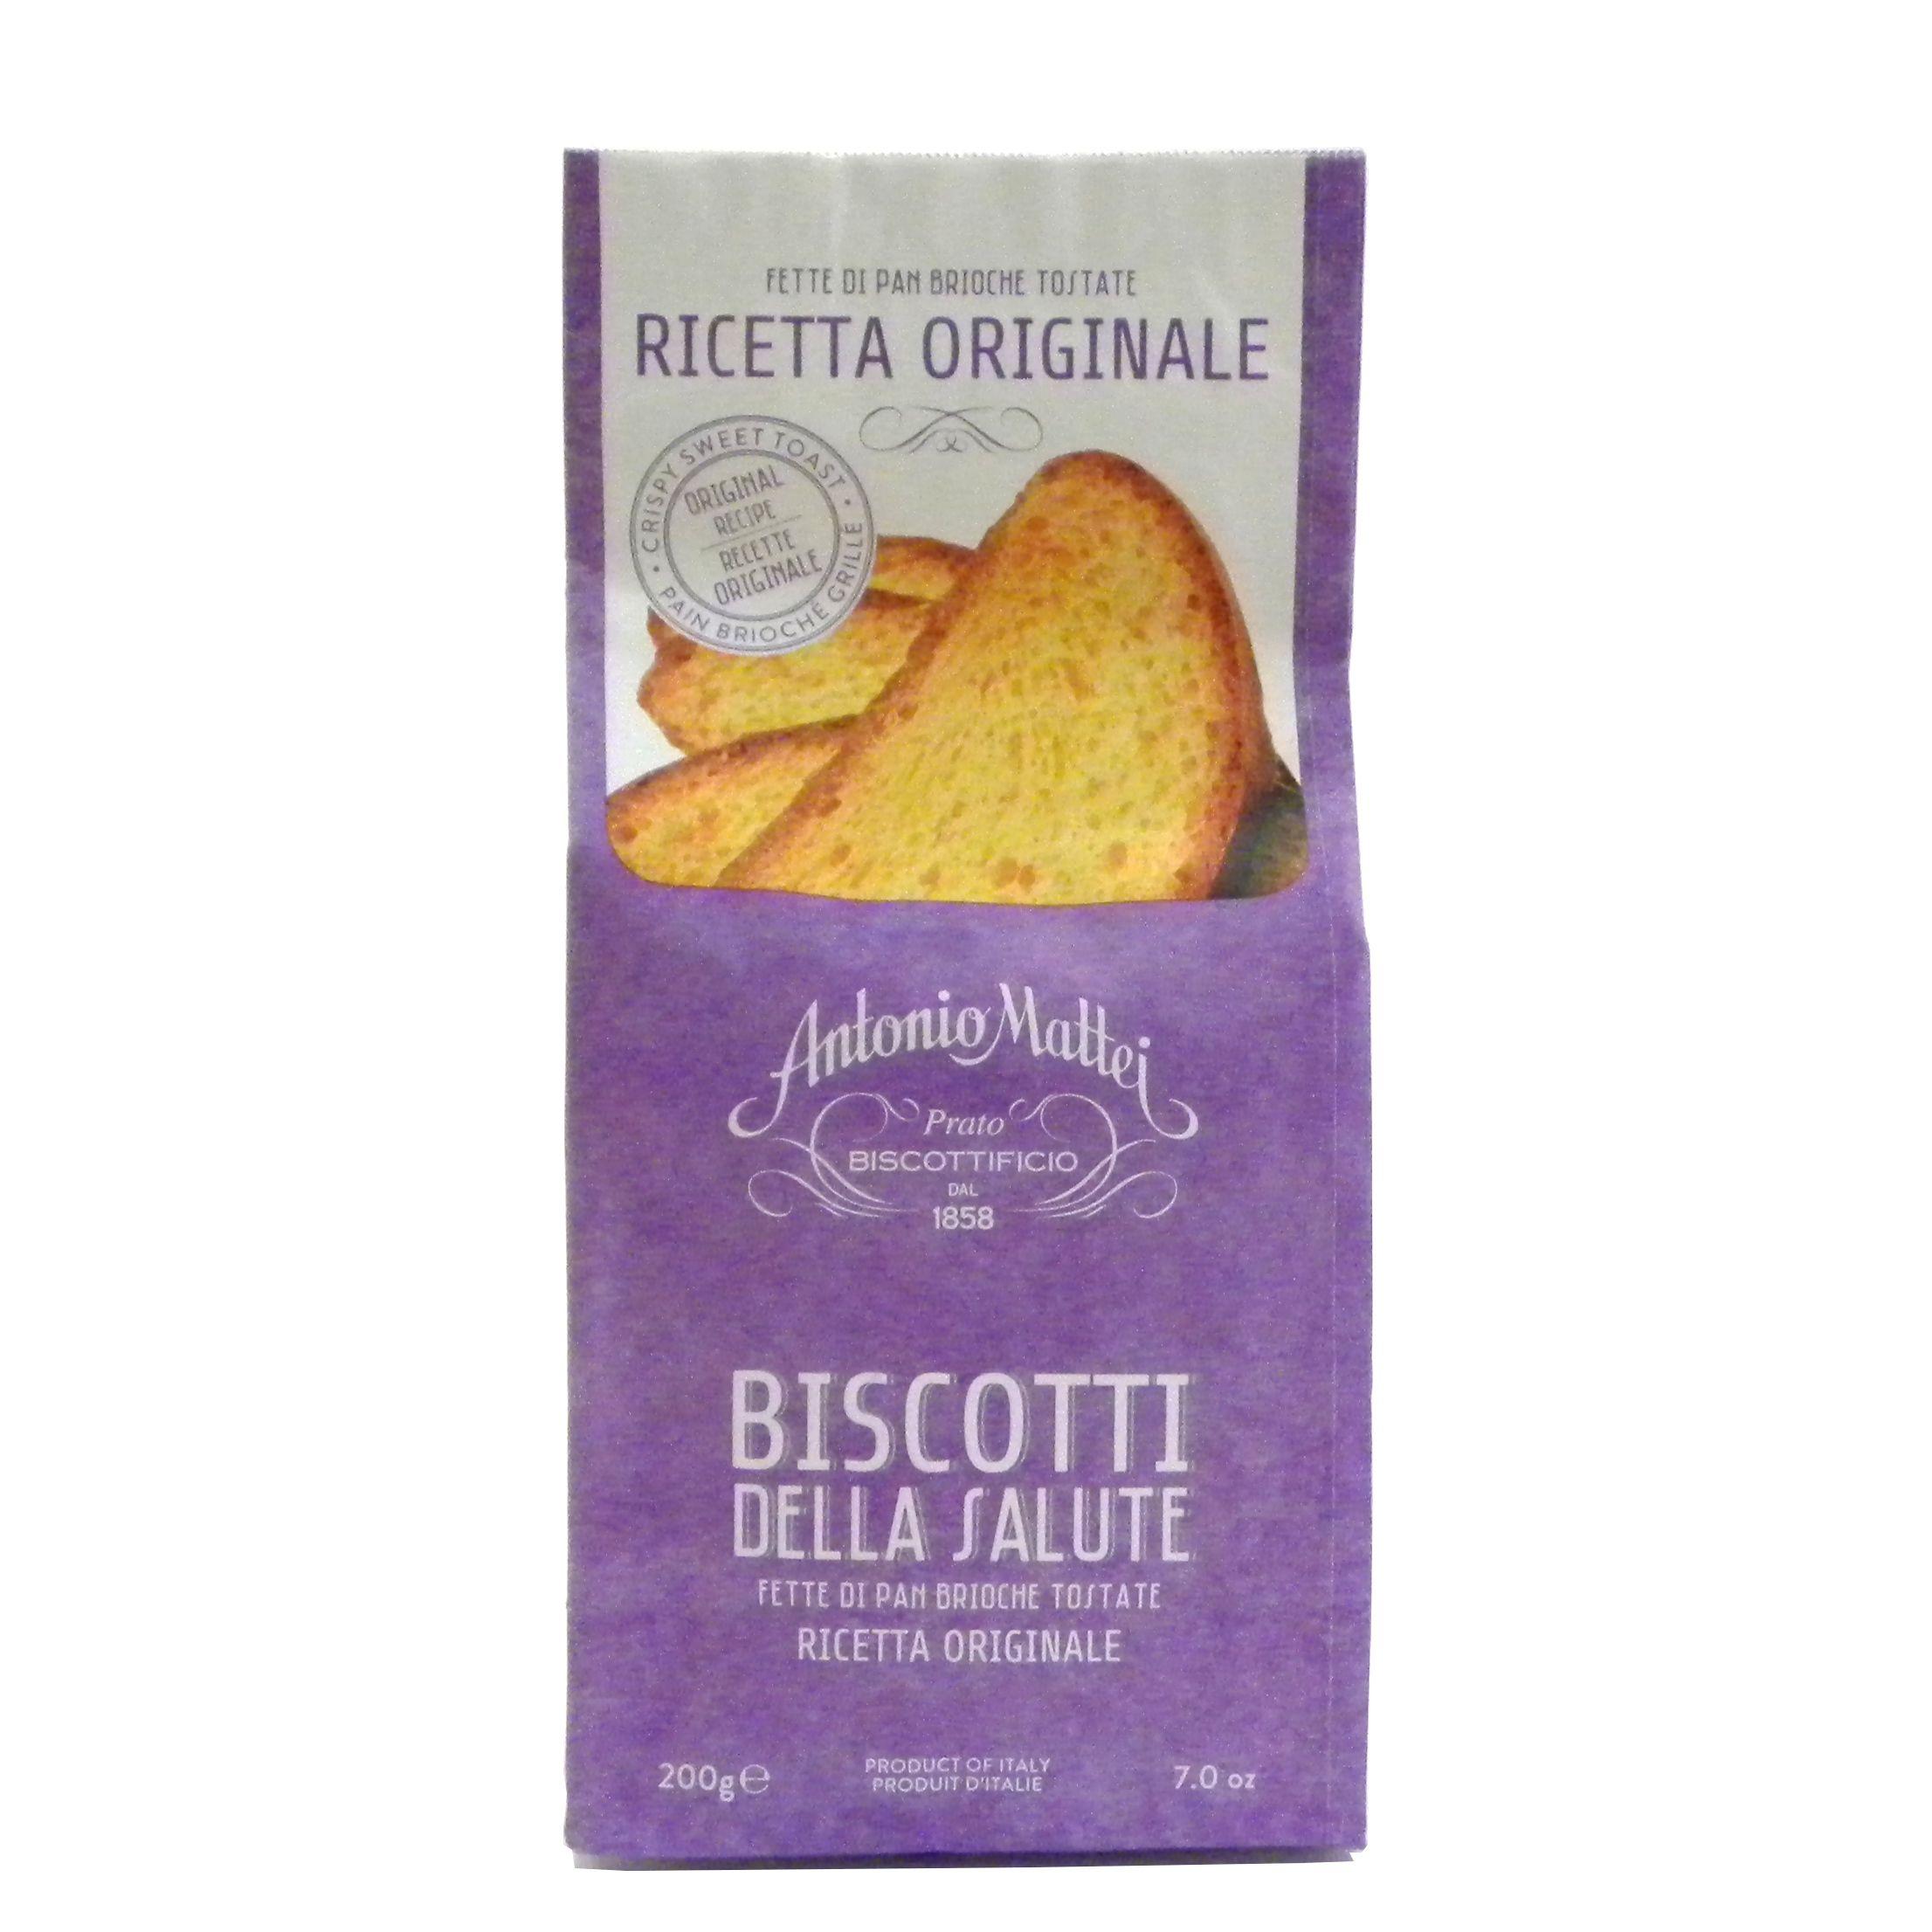 Biscotti Salute ricetta originale Mattei – Gustorotondo – Italian food boutique